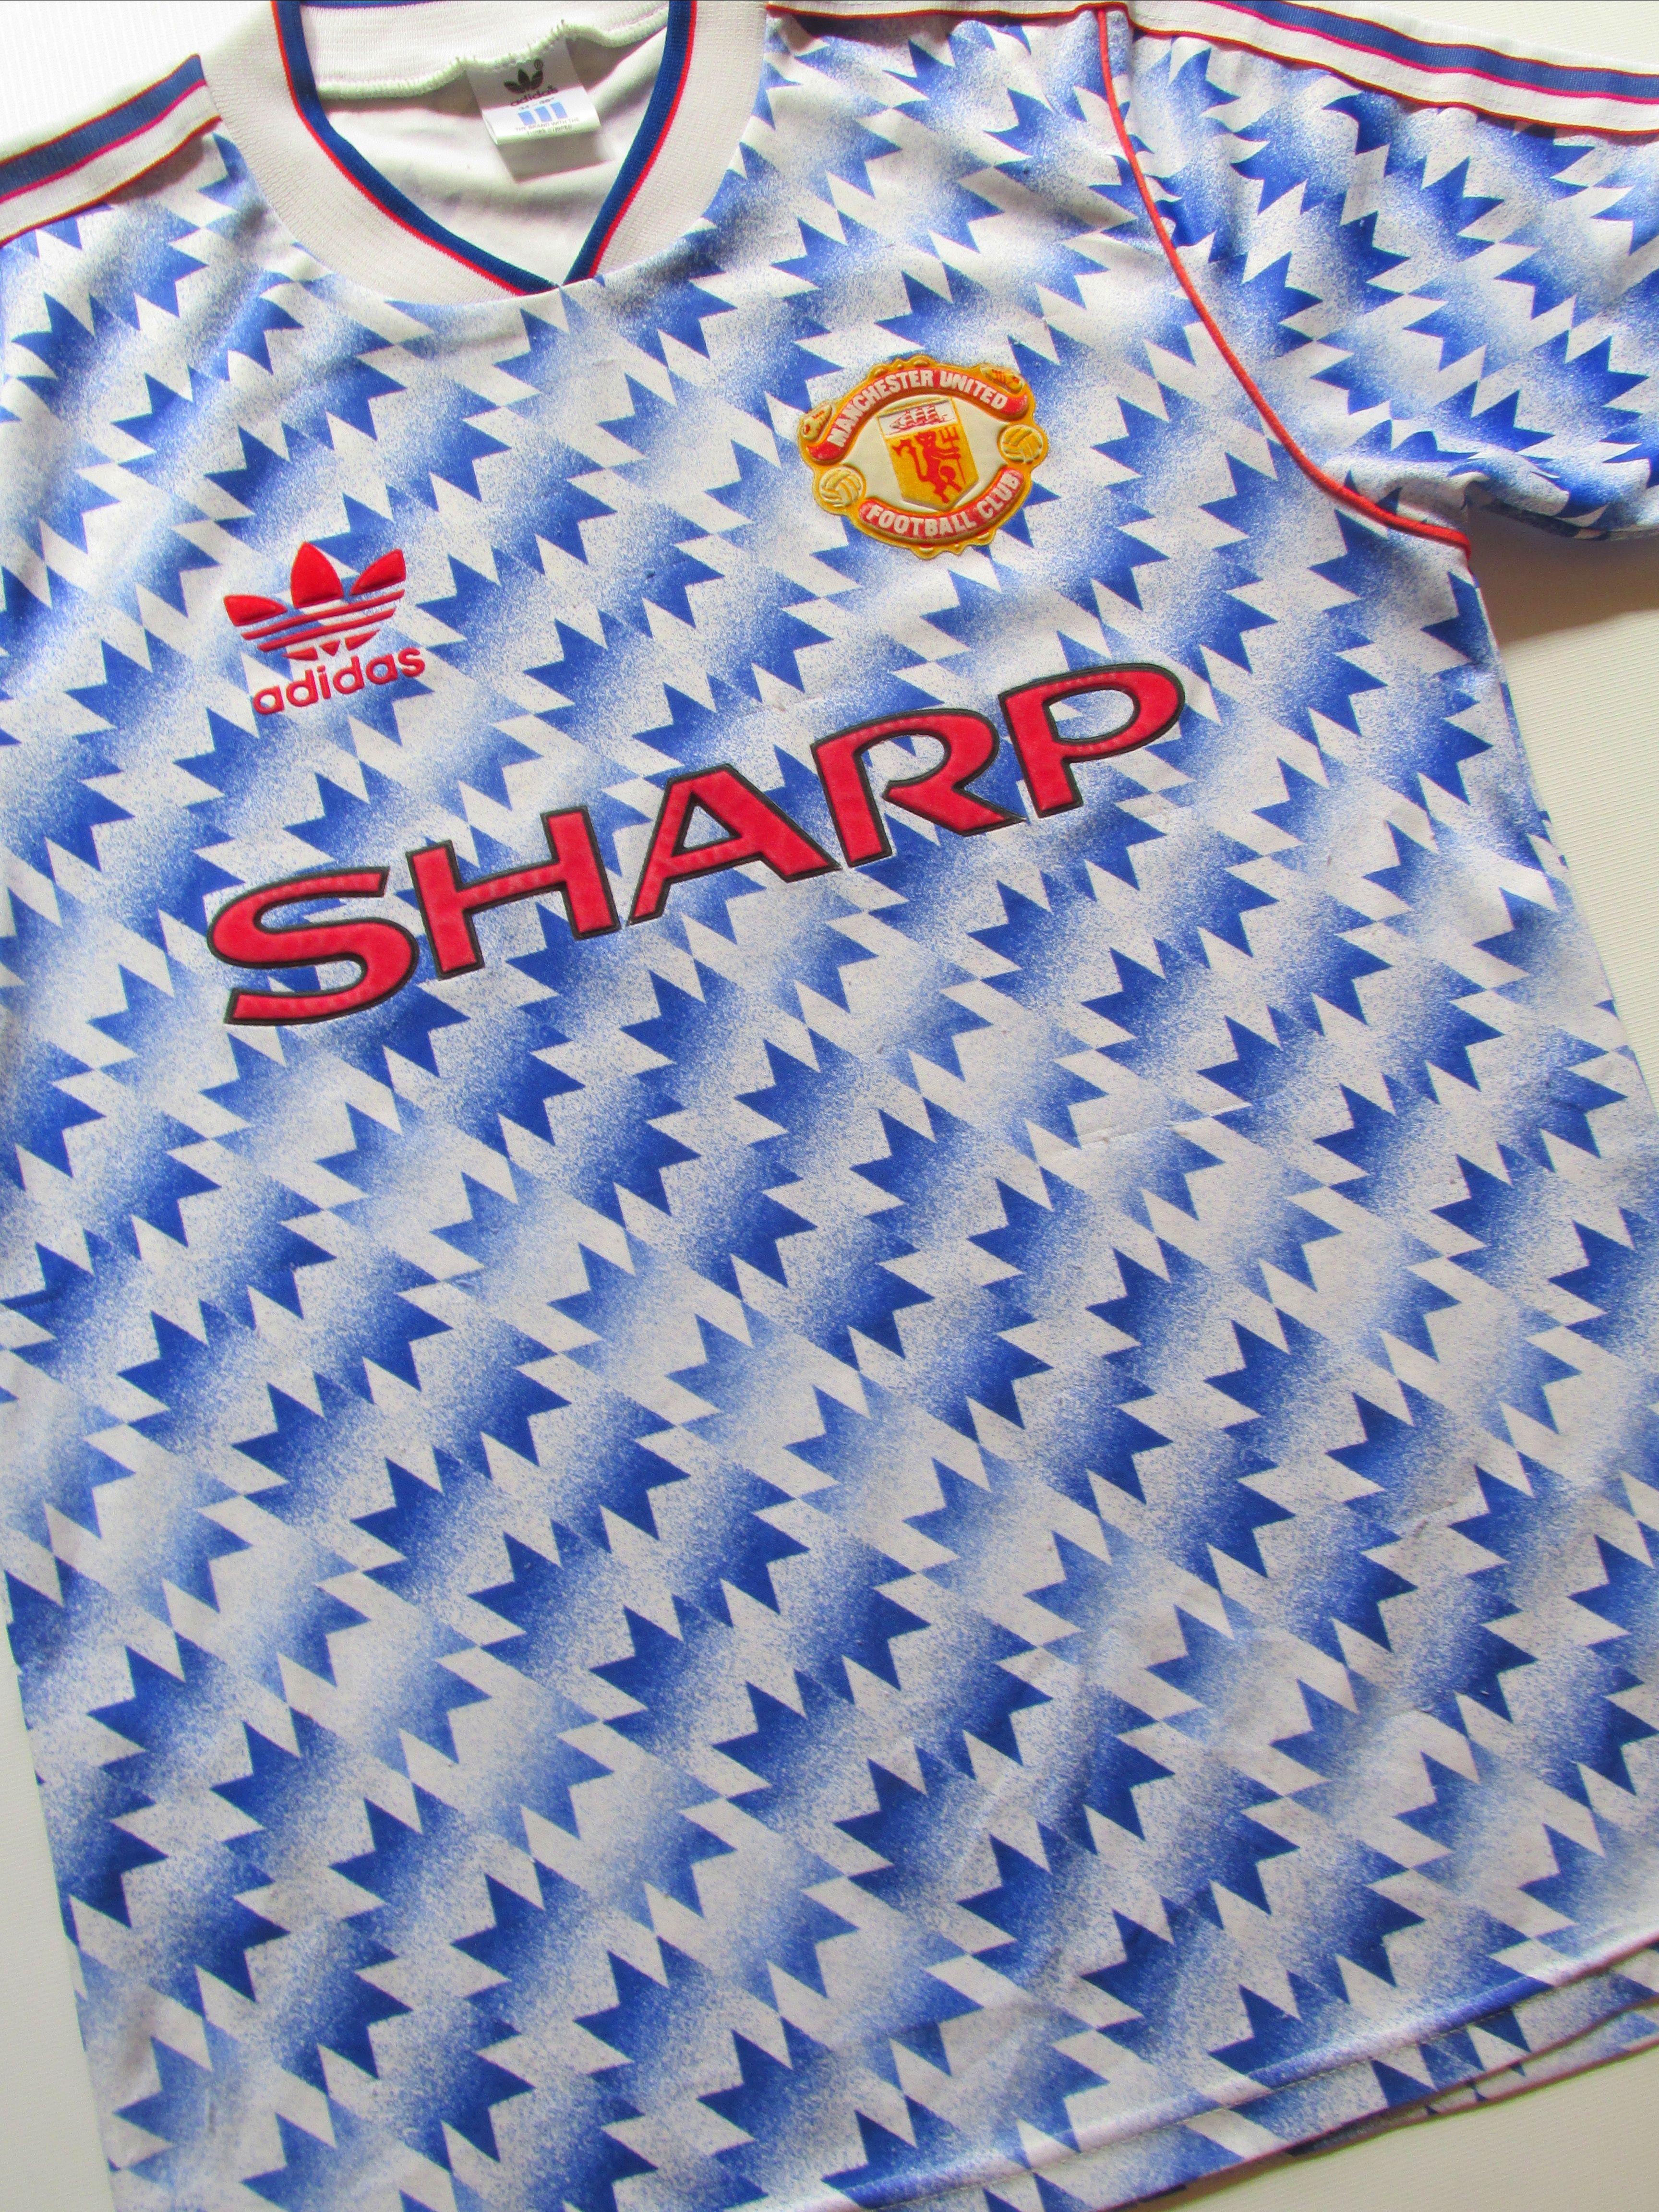 Manchester United 1990/1991/1992 away football shirt by Adidas ...